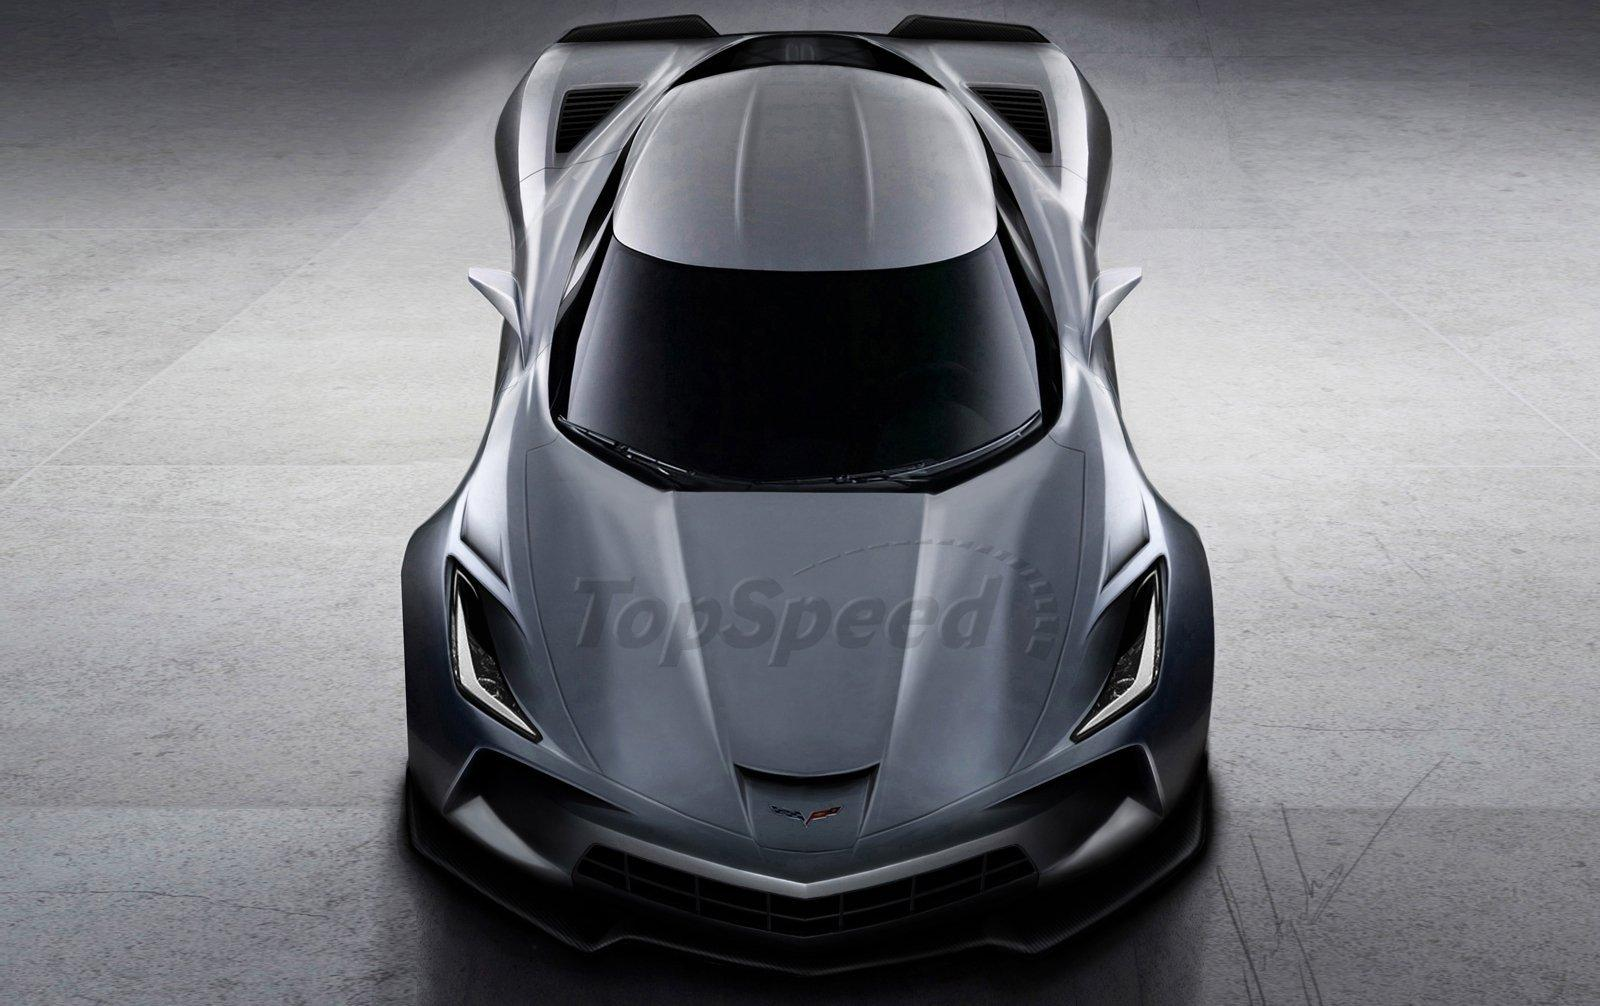 2020 Corvette Wallpapers - Wallpaper Cave